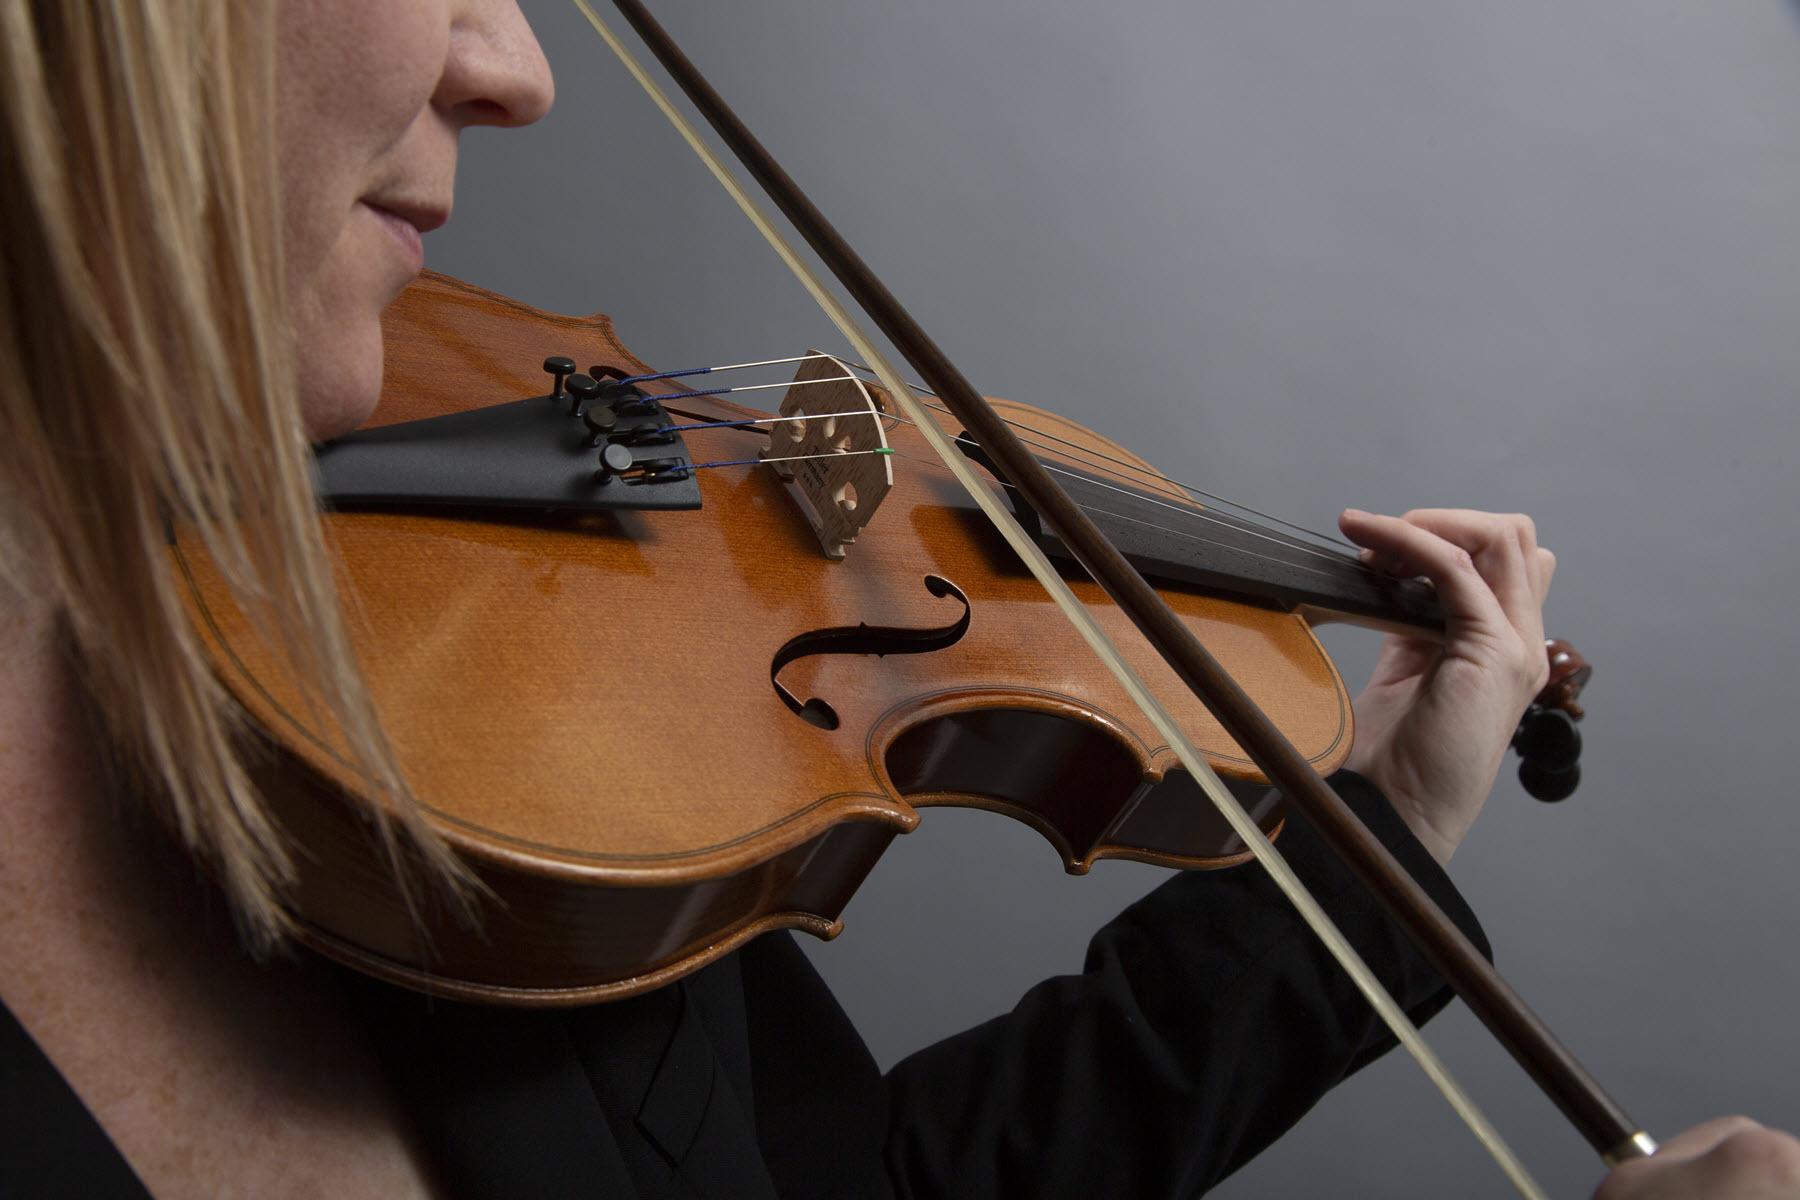 Closeup of young woman playing violin.